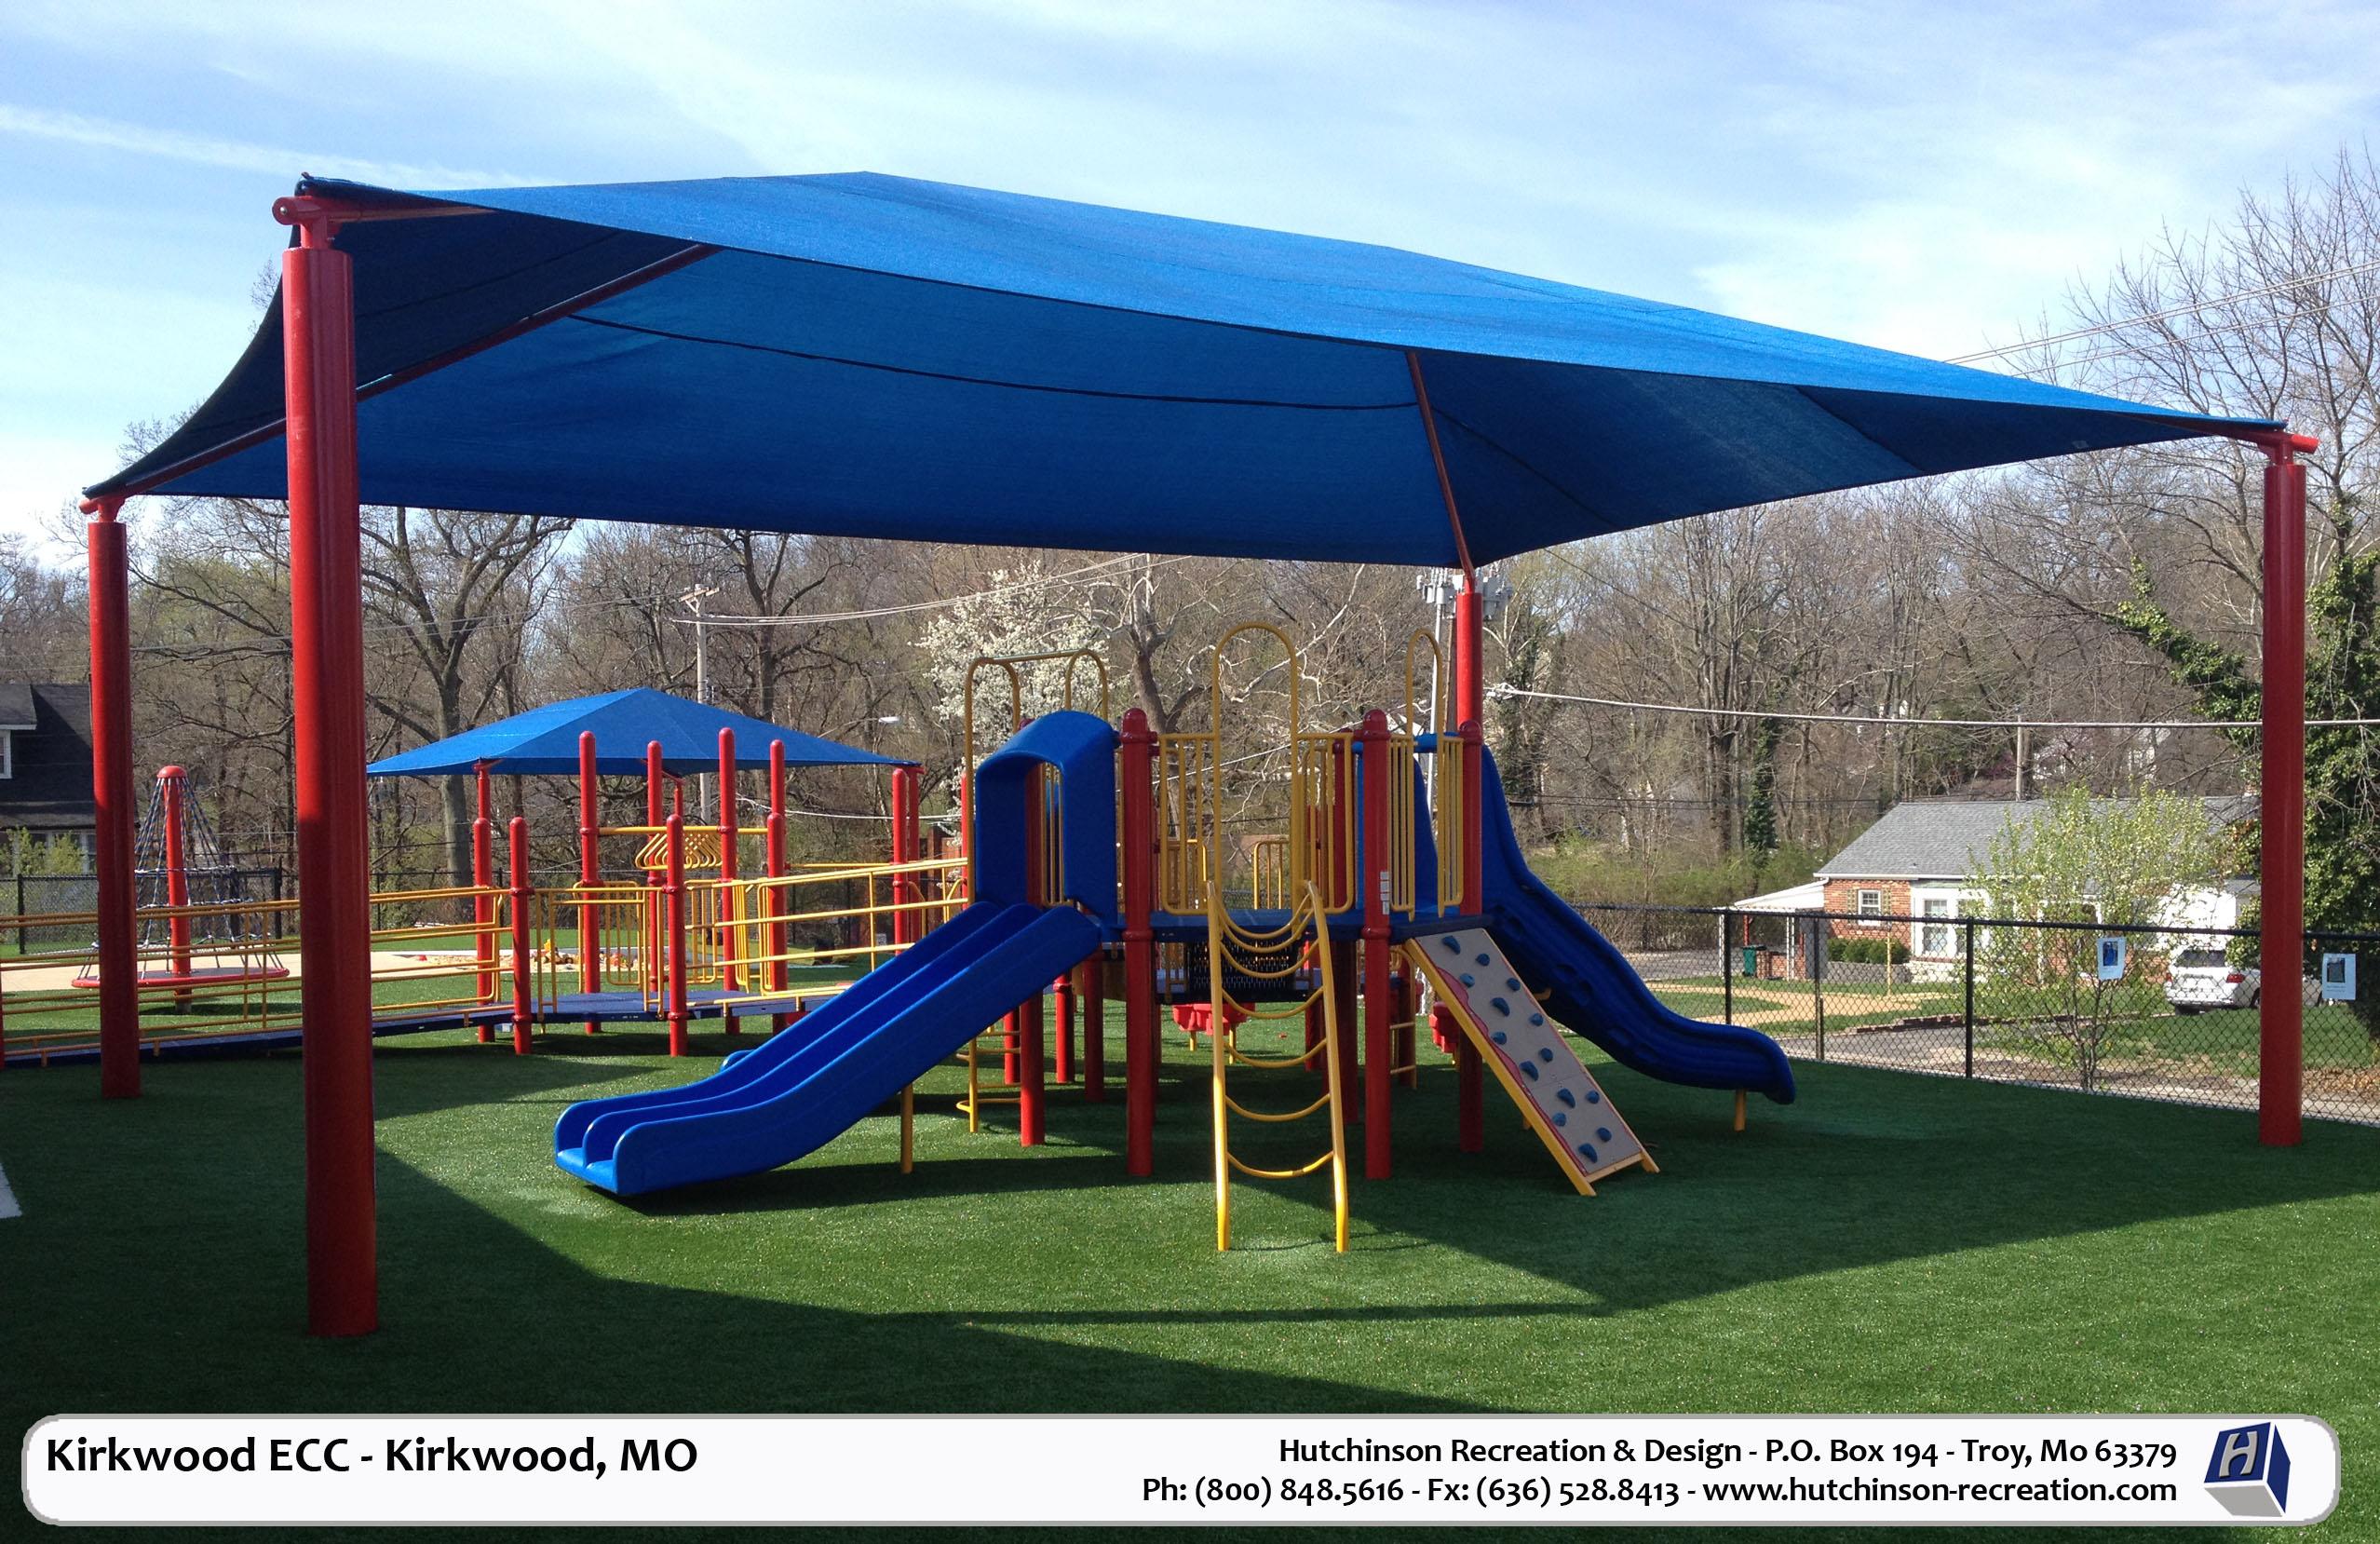 Kirkwood ECC - Kirkwood-MO